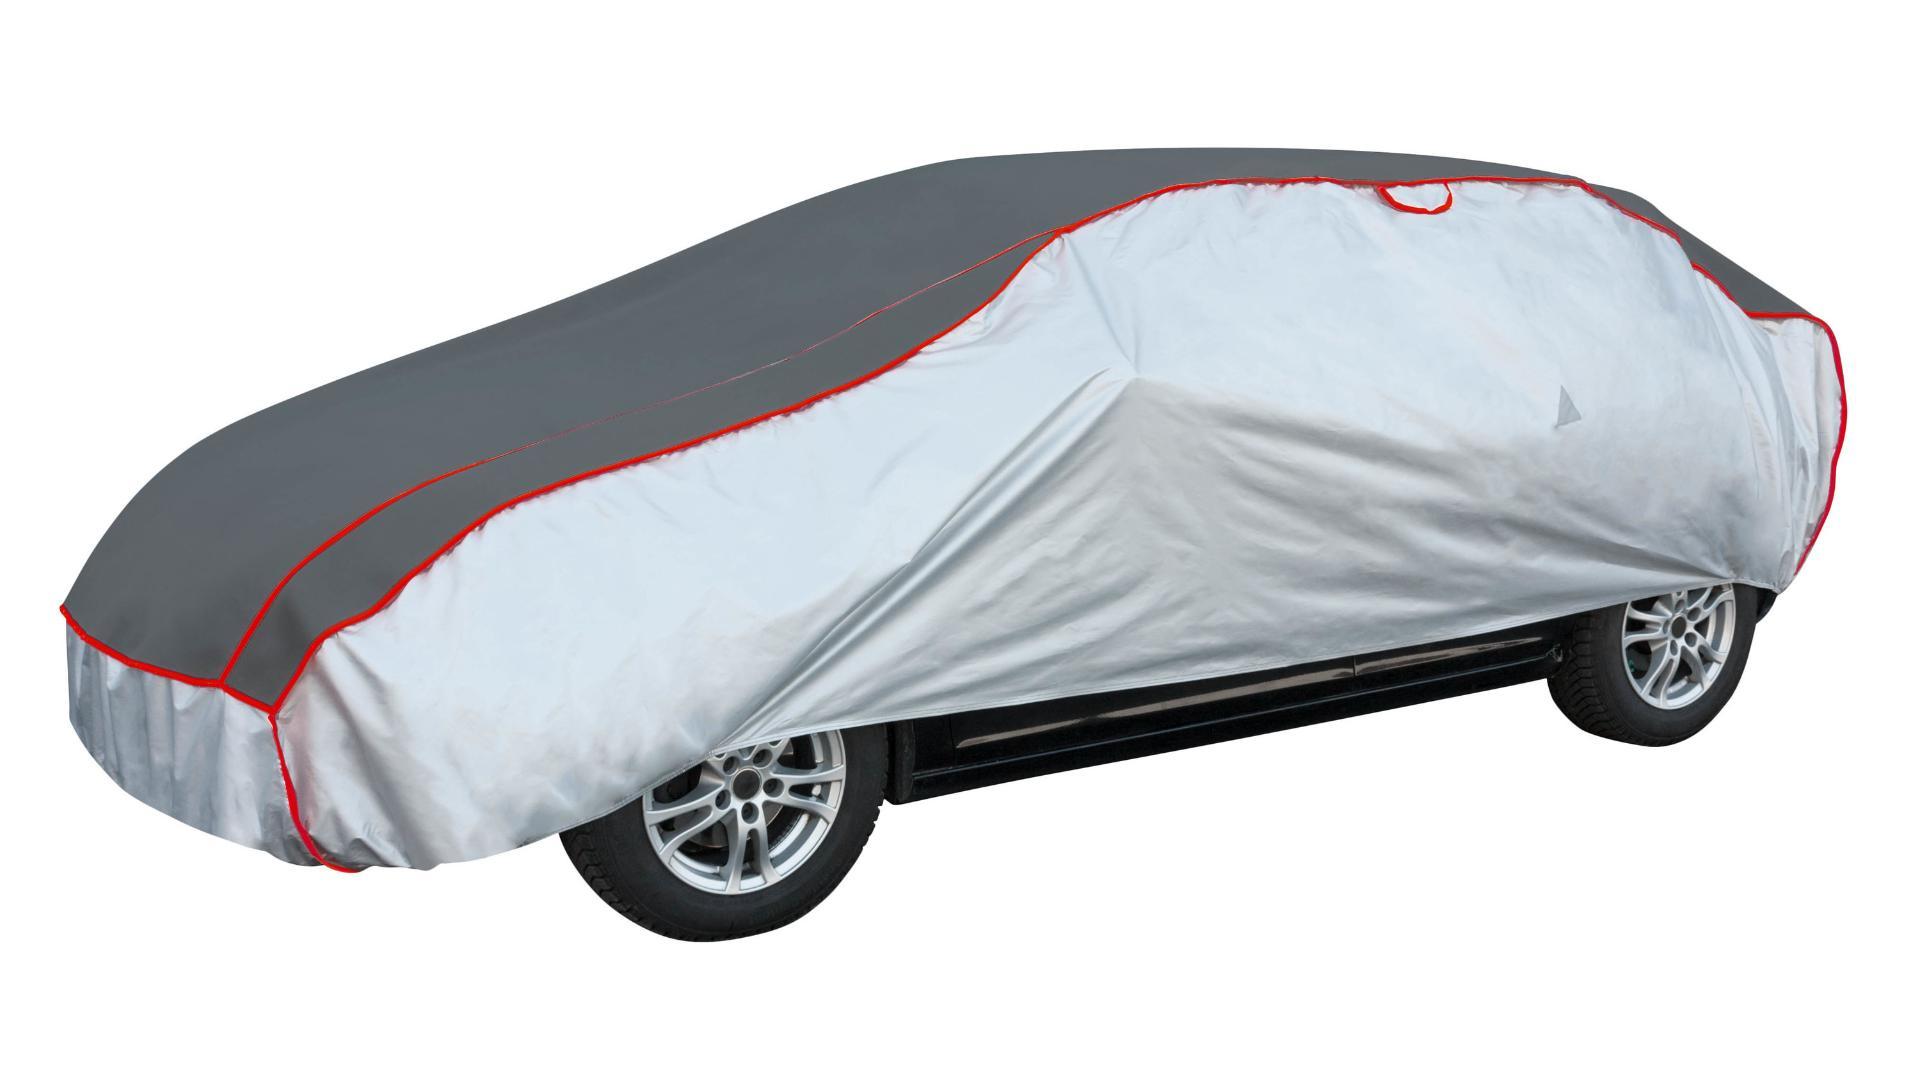 Walser plachta proti kroupám Premium Hybrid XXL 575x203x120cm